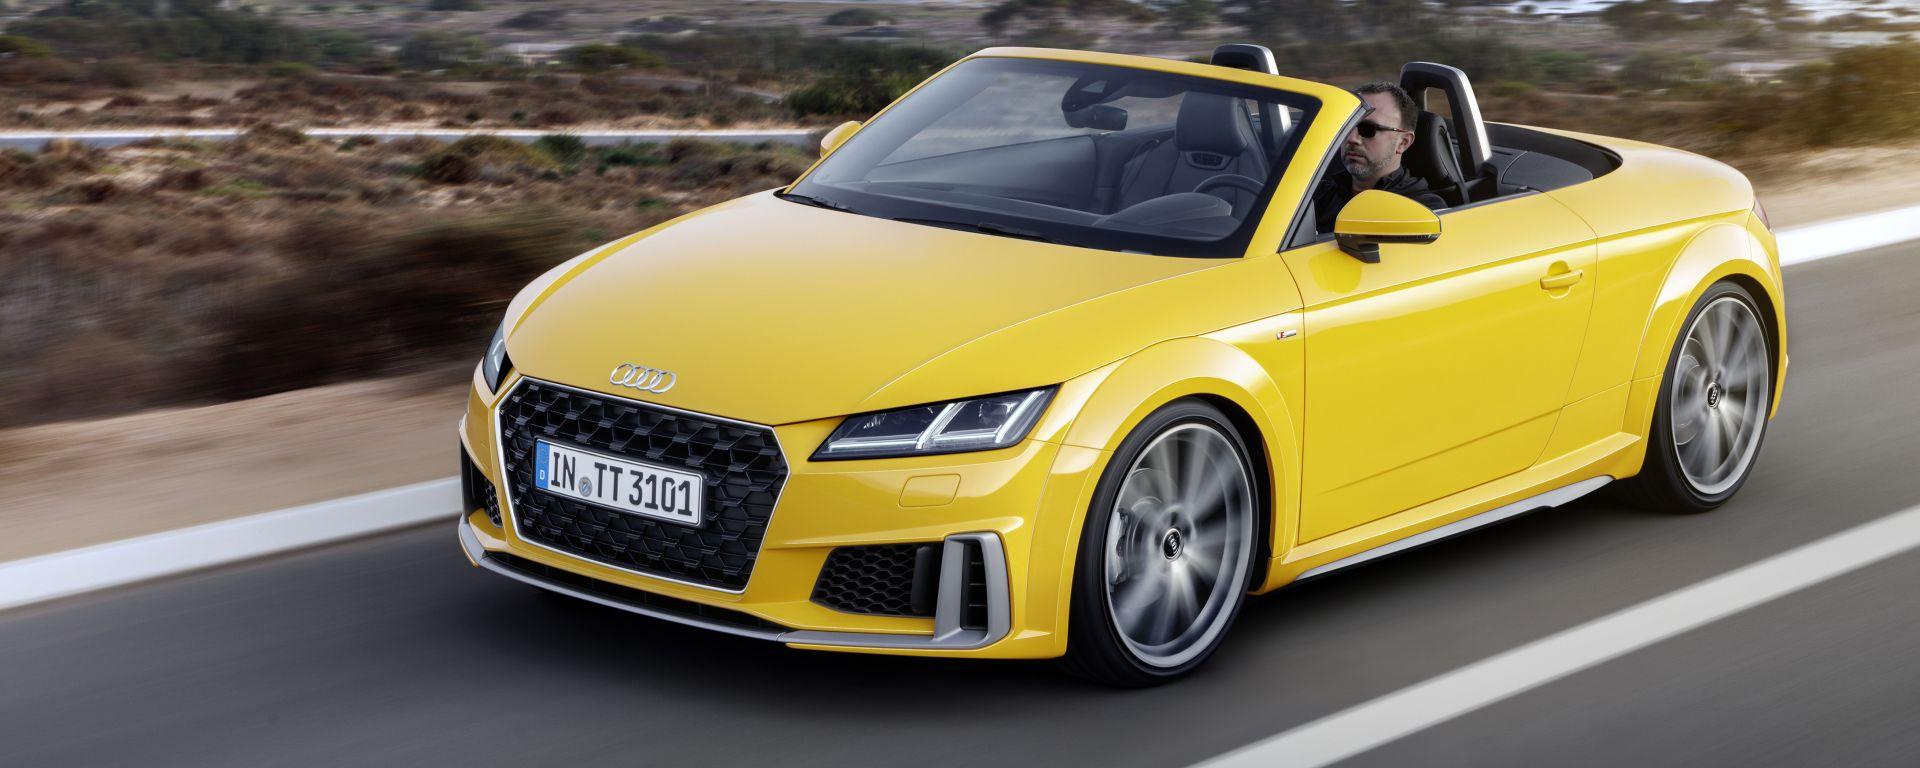 Nuova Audi TT frontale